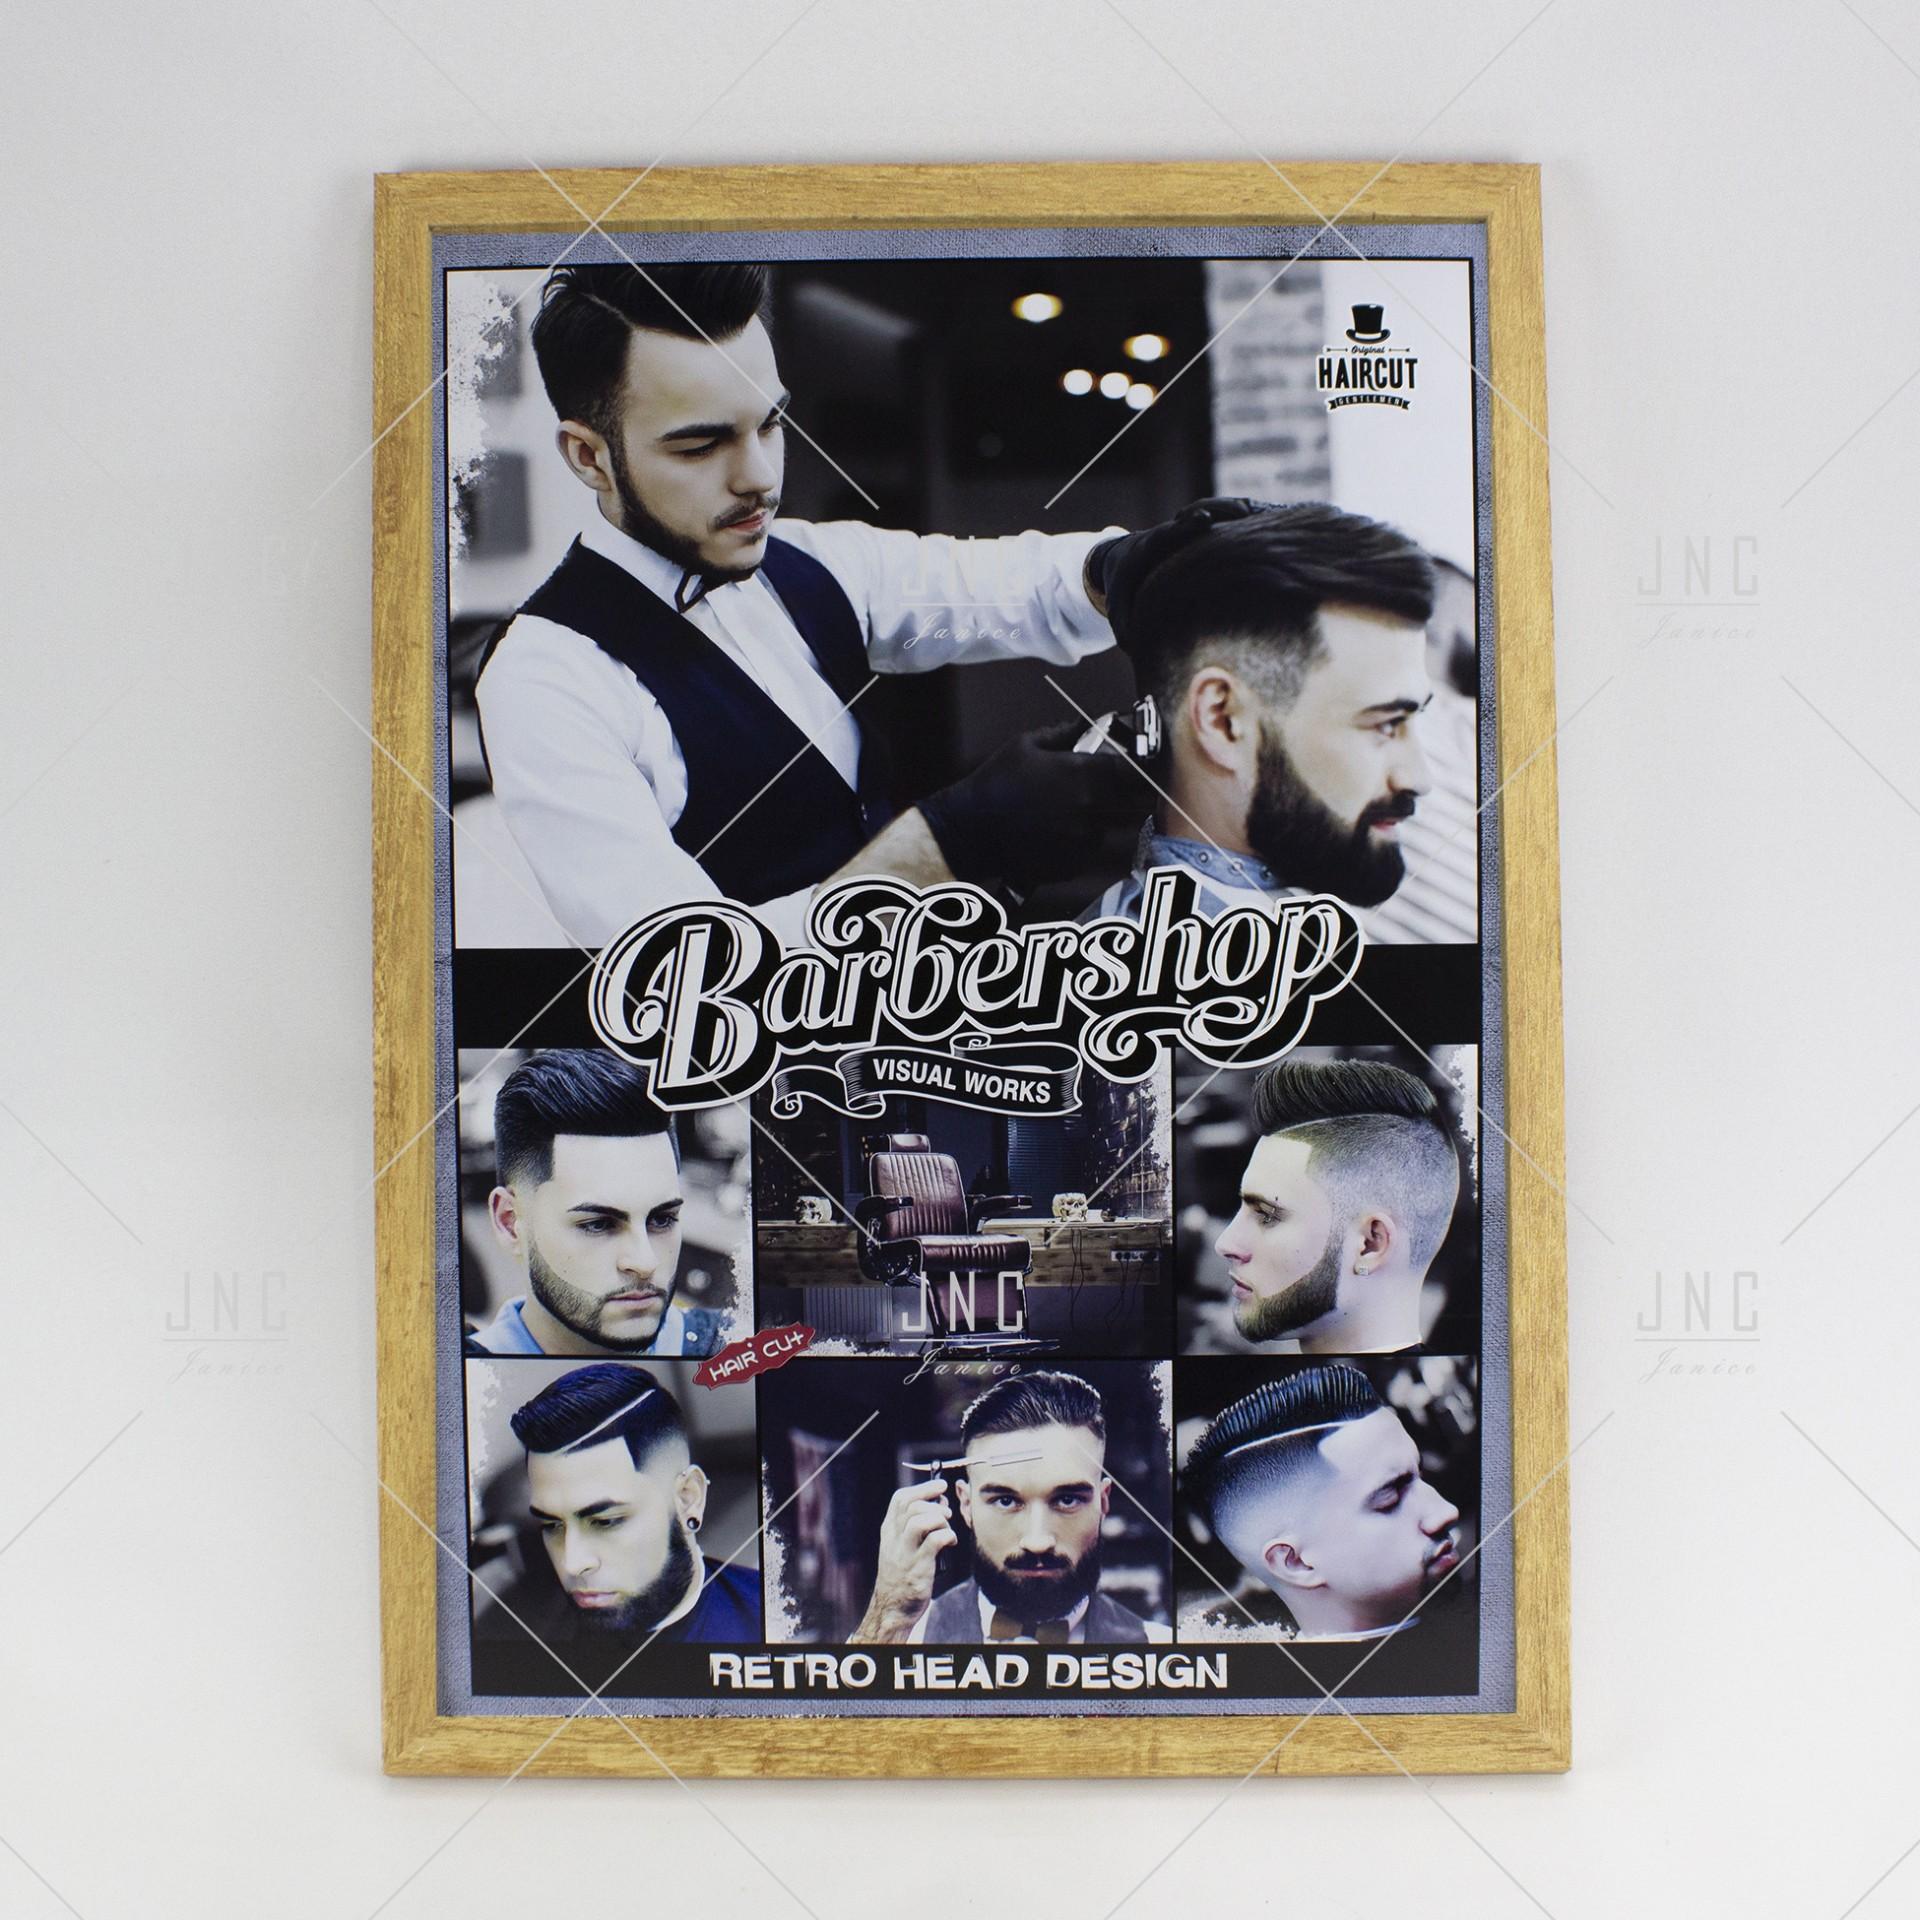 Quadro Barbearia #6 - Ref.862162